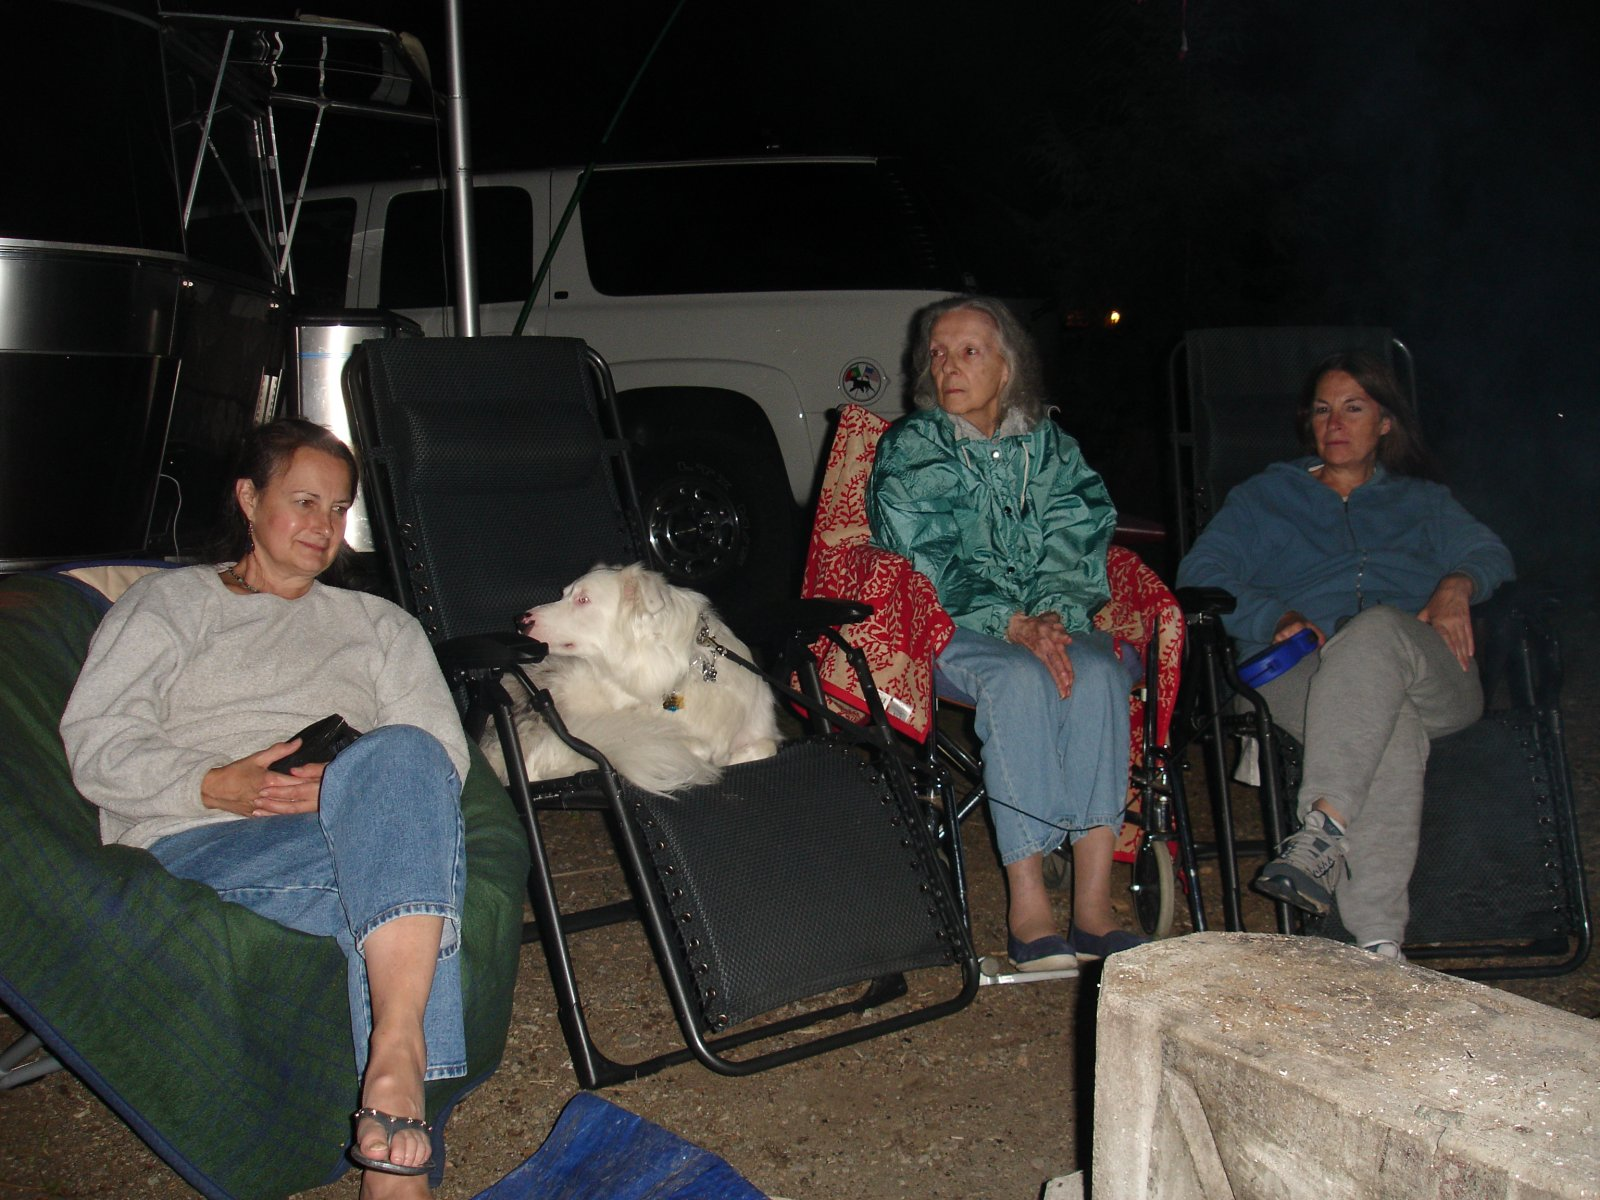 Click image for larger version  Name:Piseco Lake JulyAug 2009 164.jpg Views:85 Size:298.8 KB ID:93285